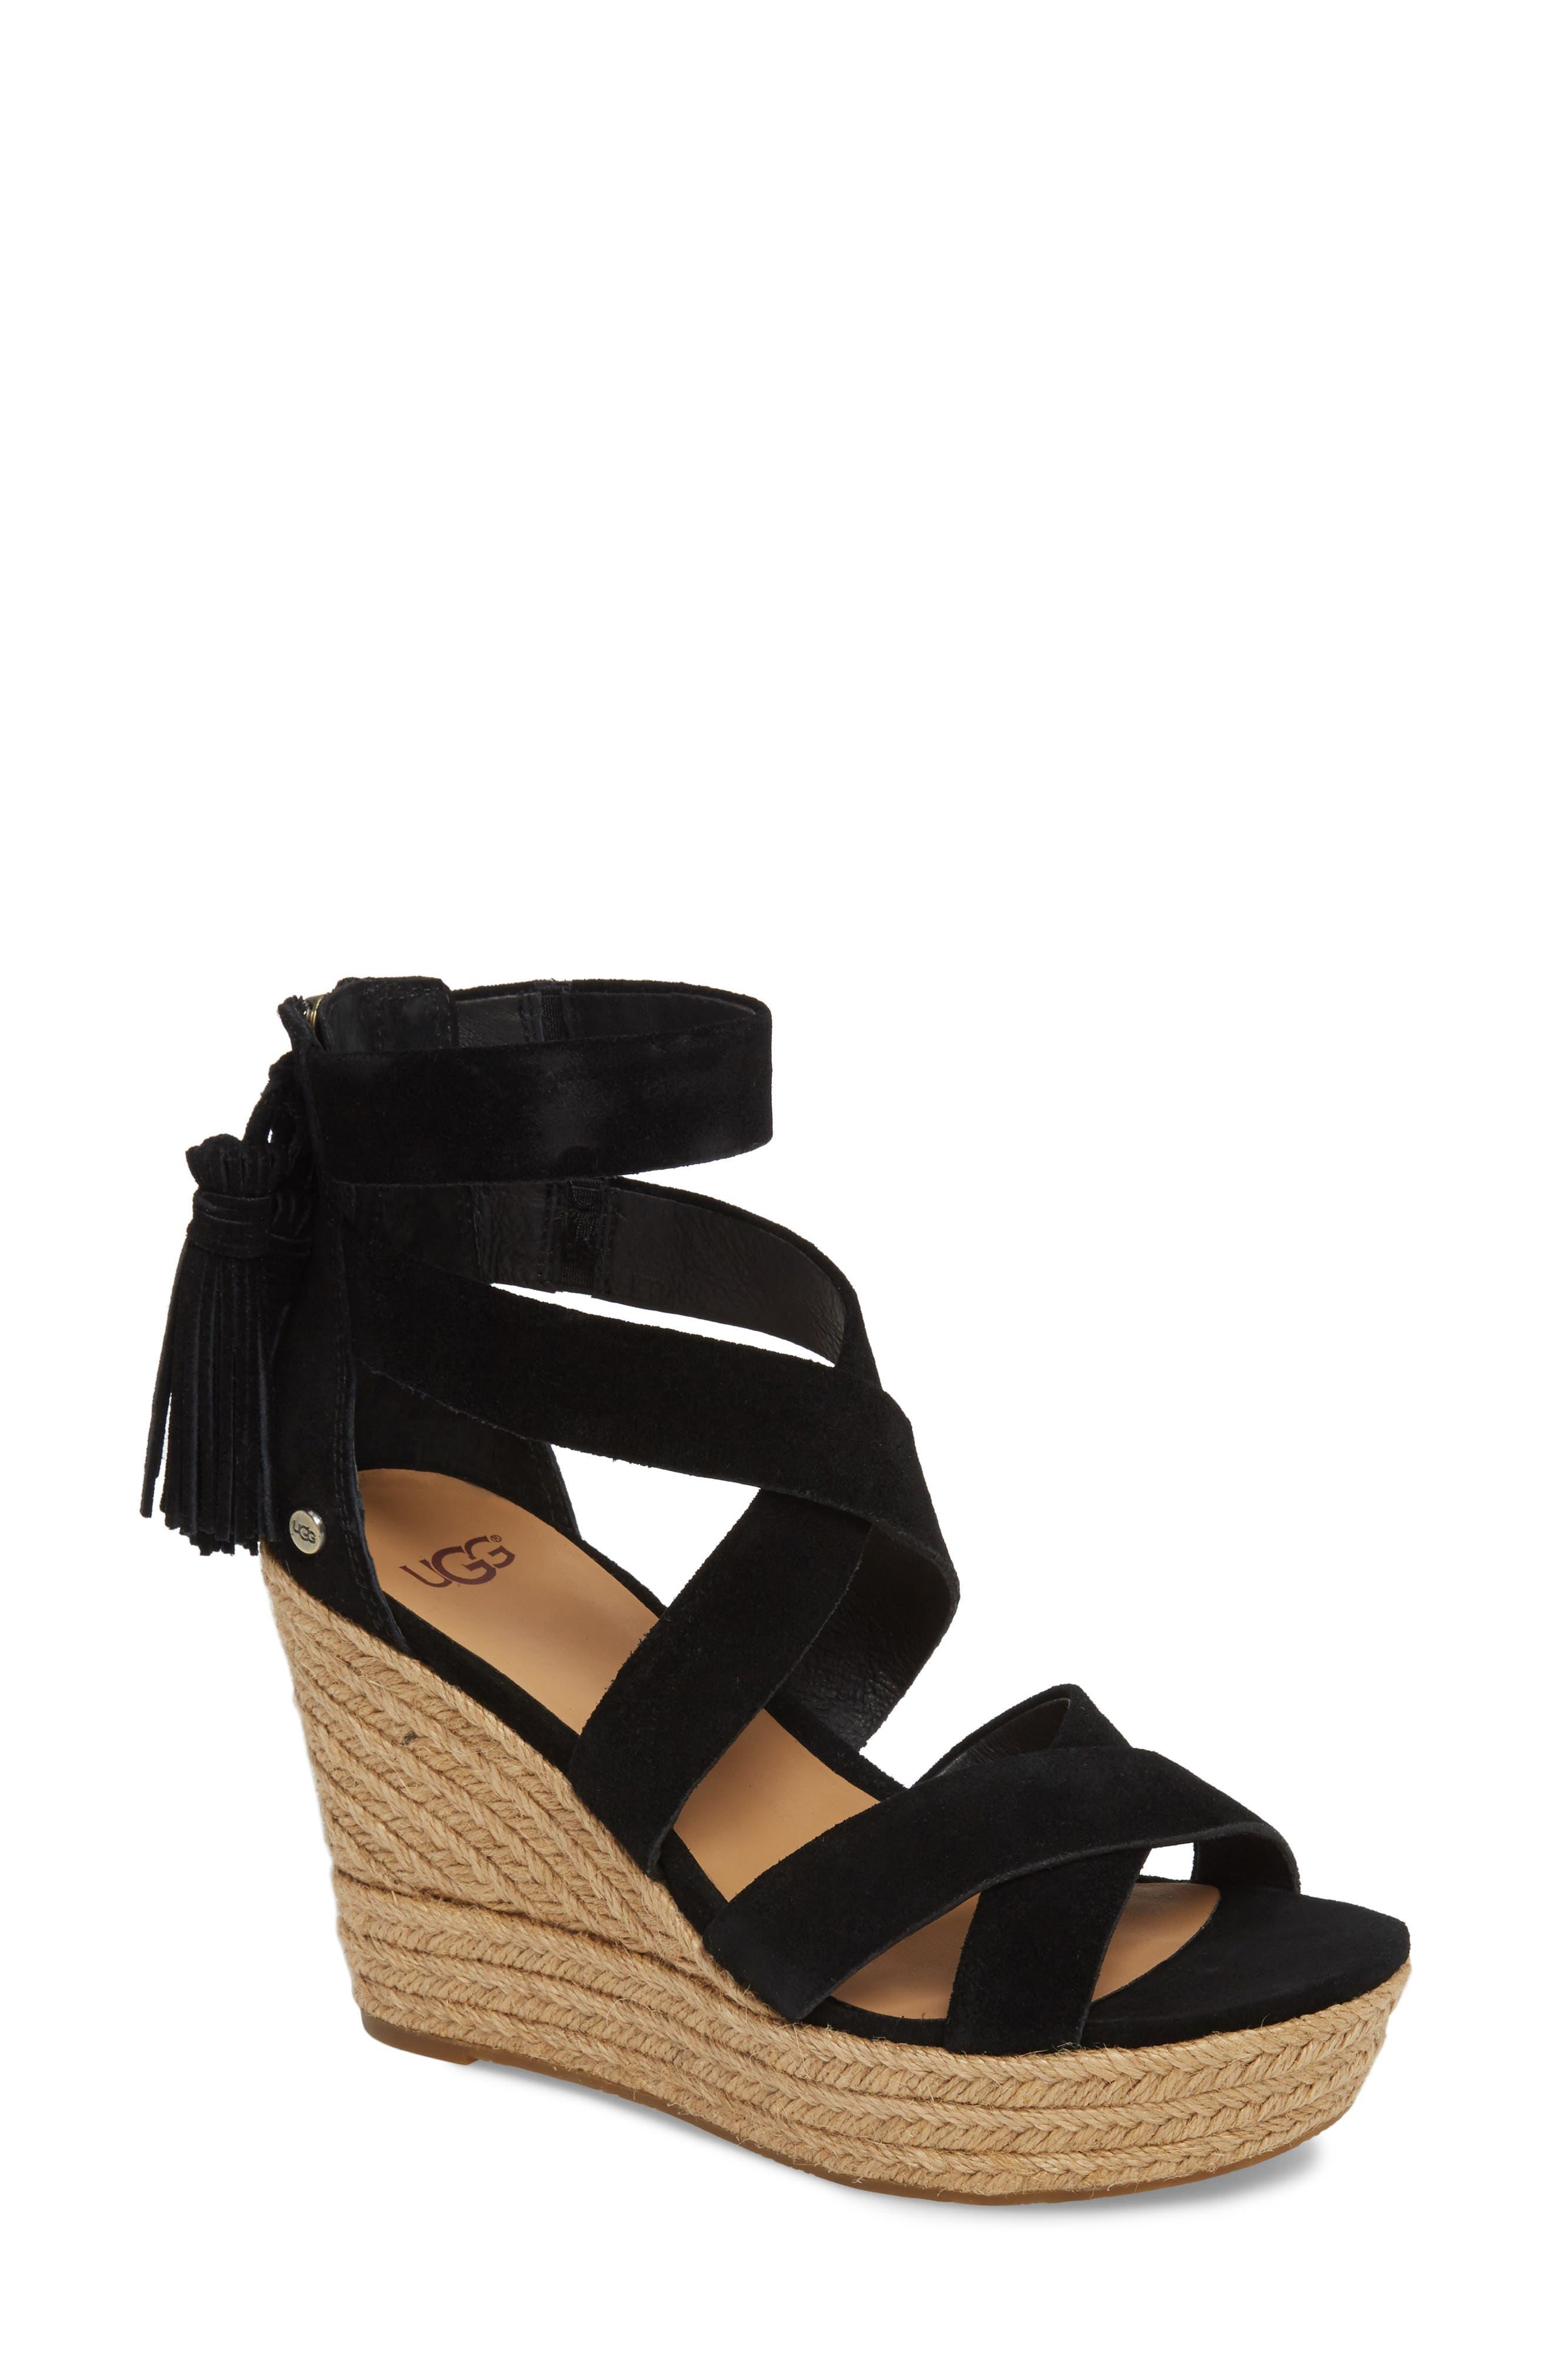 Raquel Platform Wedge Sandal,                         Main,                         color, 001